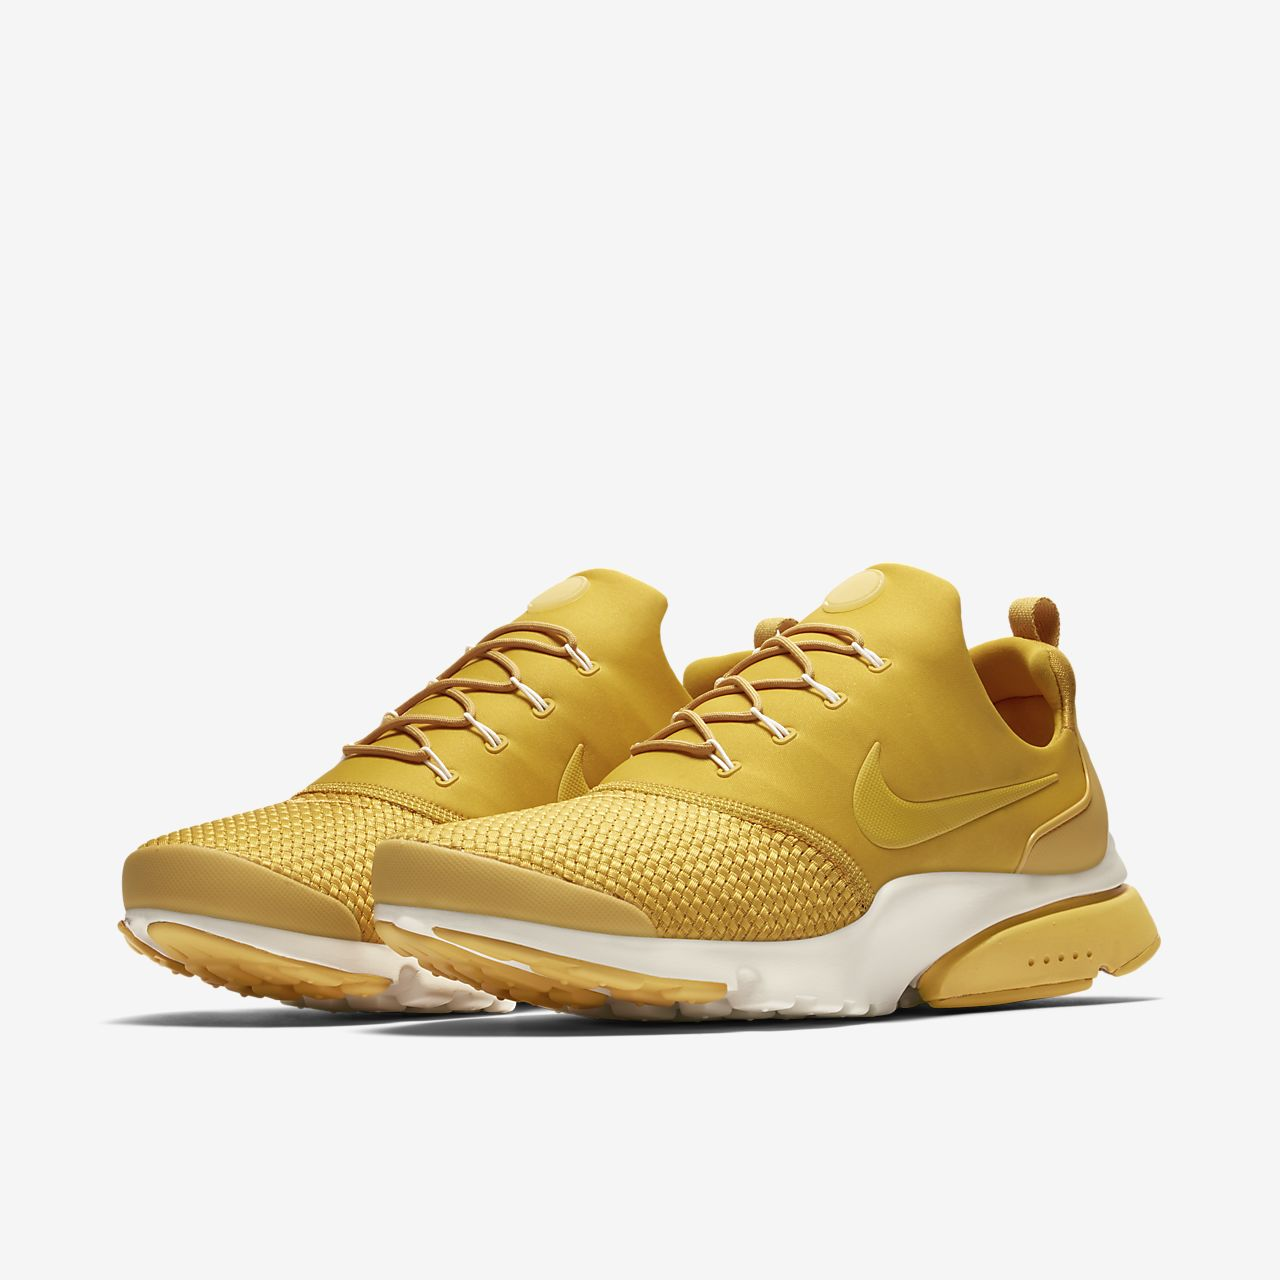 Nike Presto Fly SE Mineral Yellow/ Mineral Yellow Precio Bajo Precio Barato Venta Comercial Perfecta Precio Barato Aclaramiento Barato pYnGSgNeK4